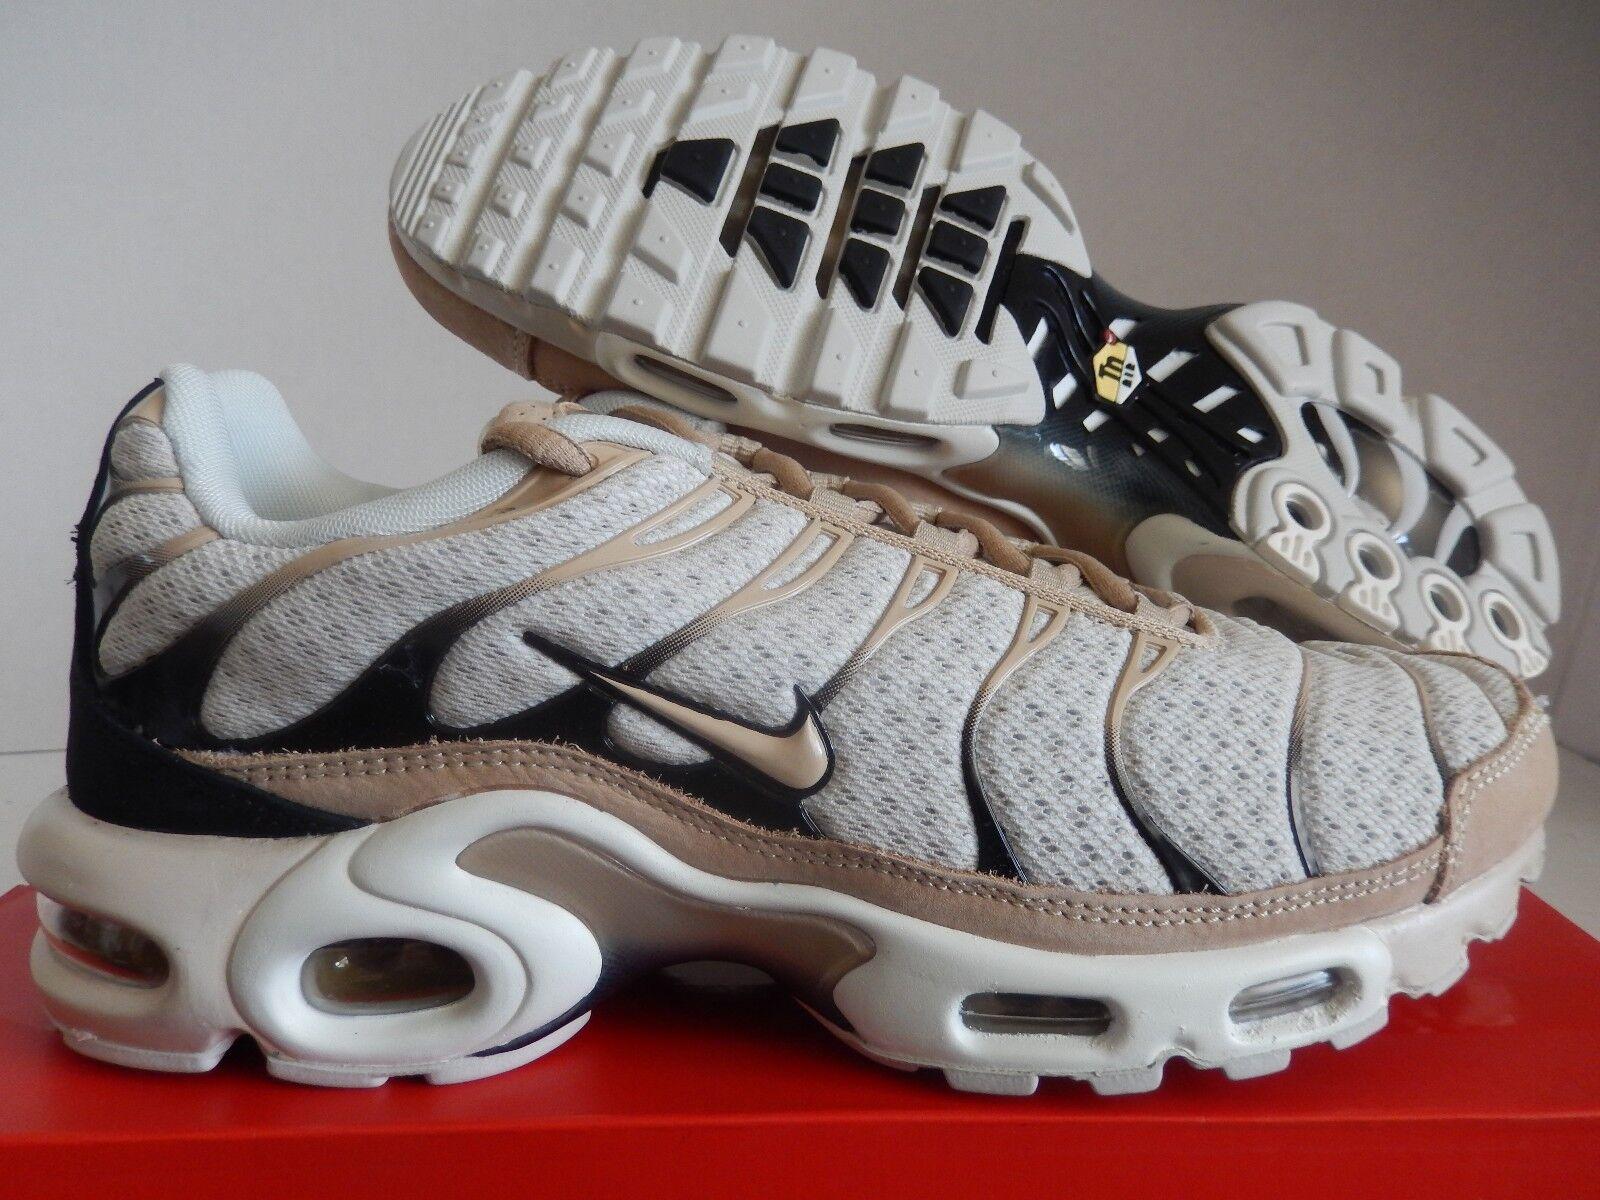 Nike Air Max Plus nikelab luz precio bone-Negro-sail-oatmeal Marrón reducción de precio luz 8b2e25